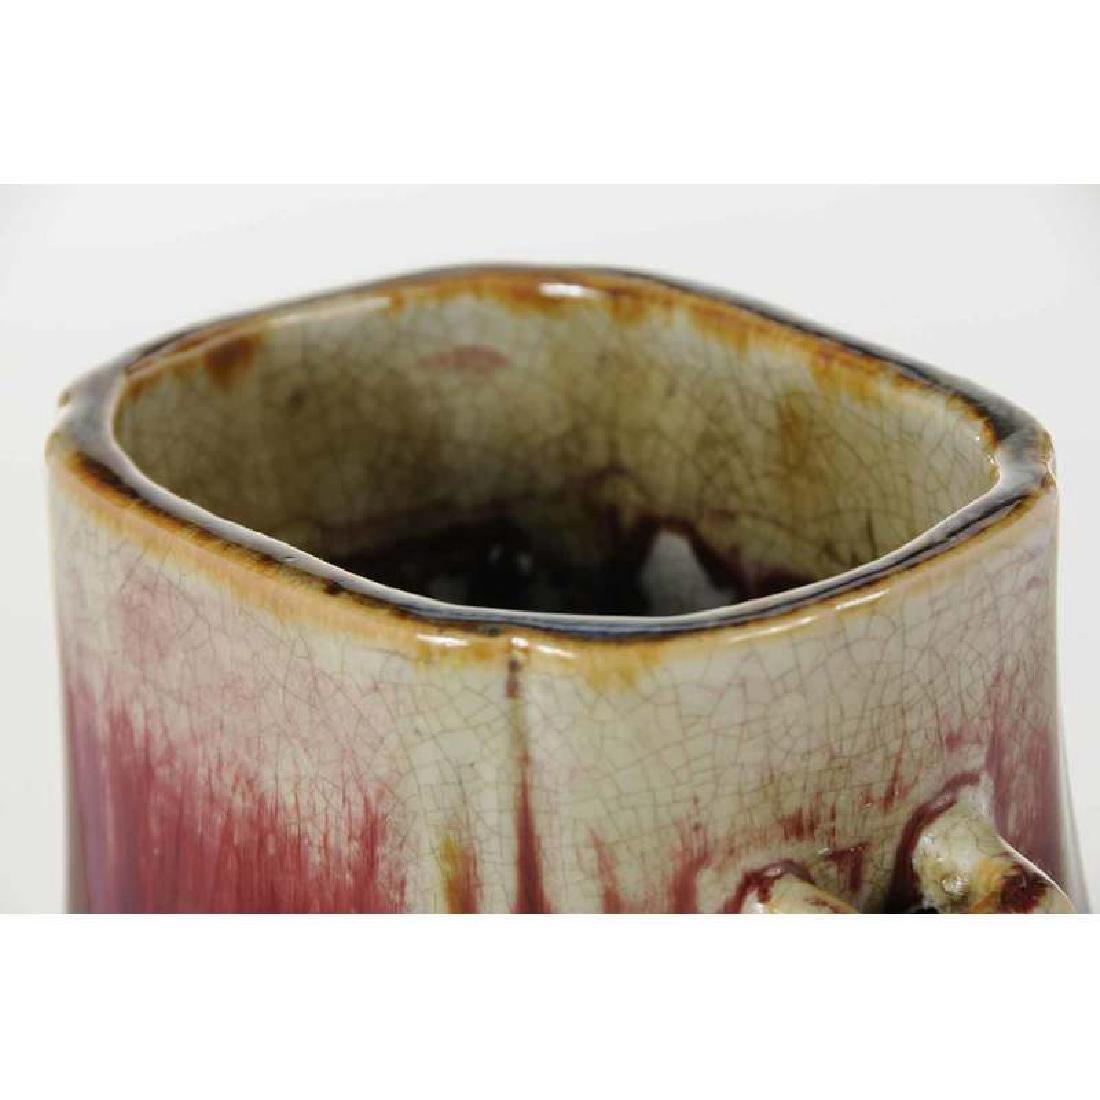 Strawberry Glaze Gu Form Porcelain Vase - 5